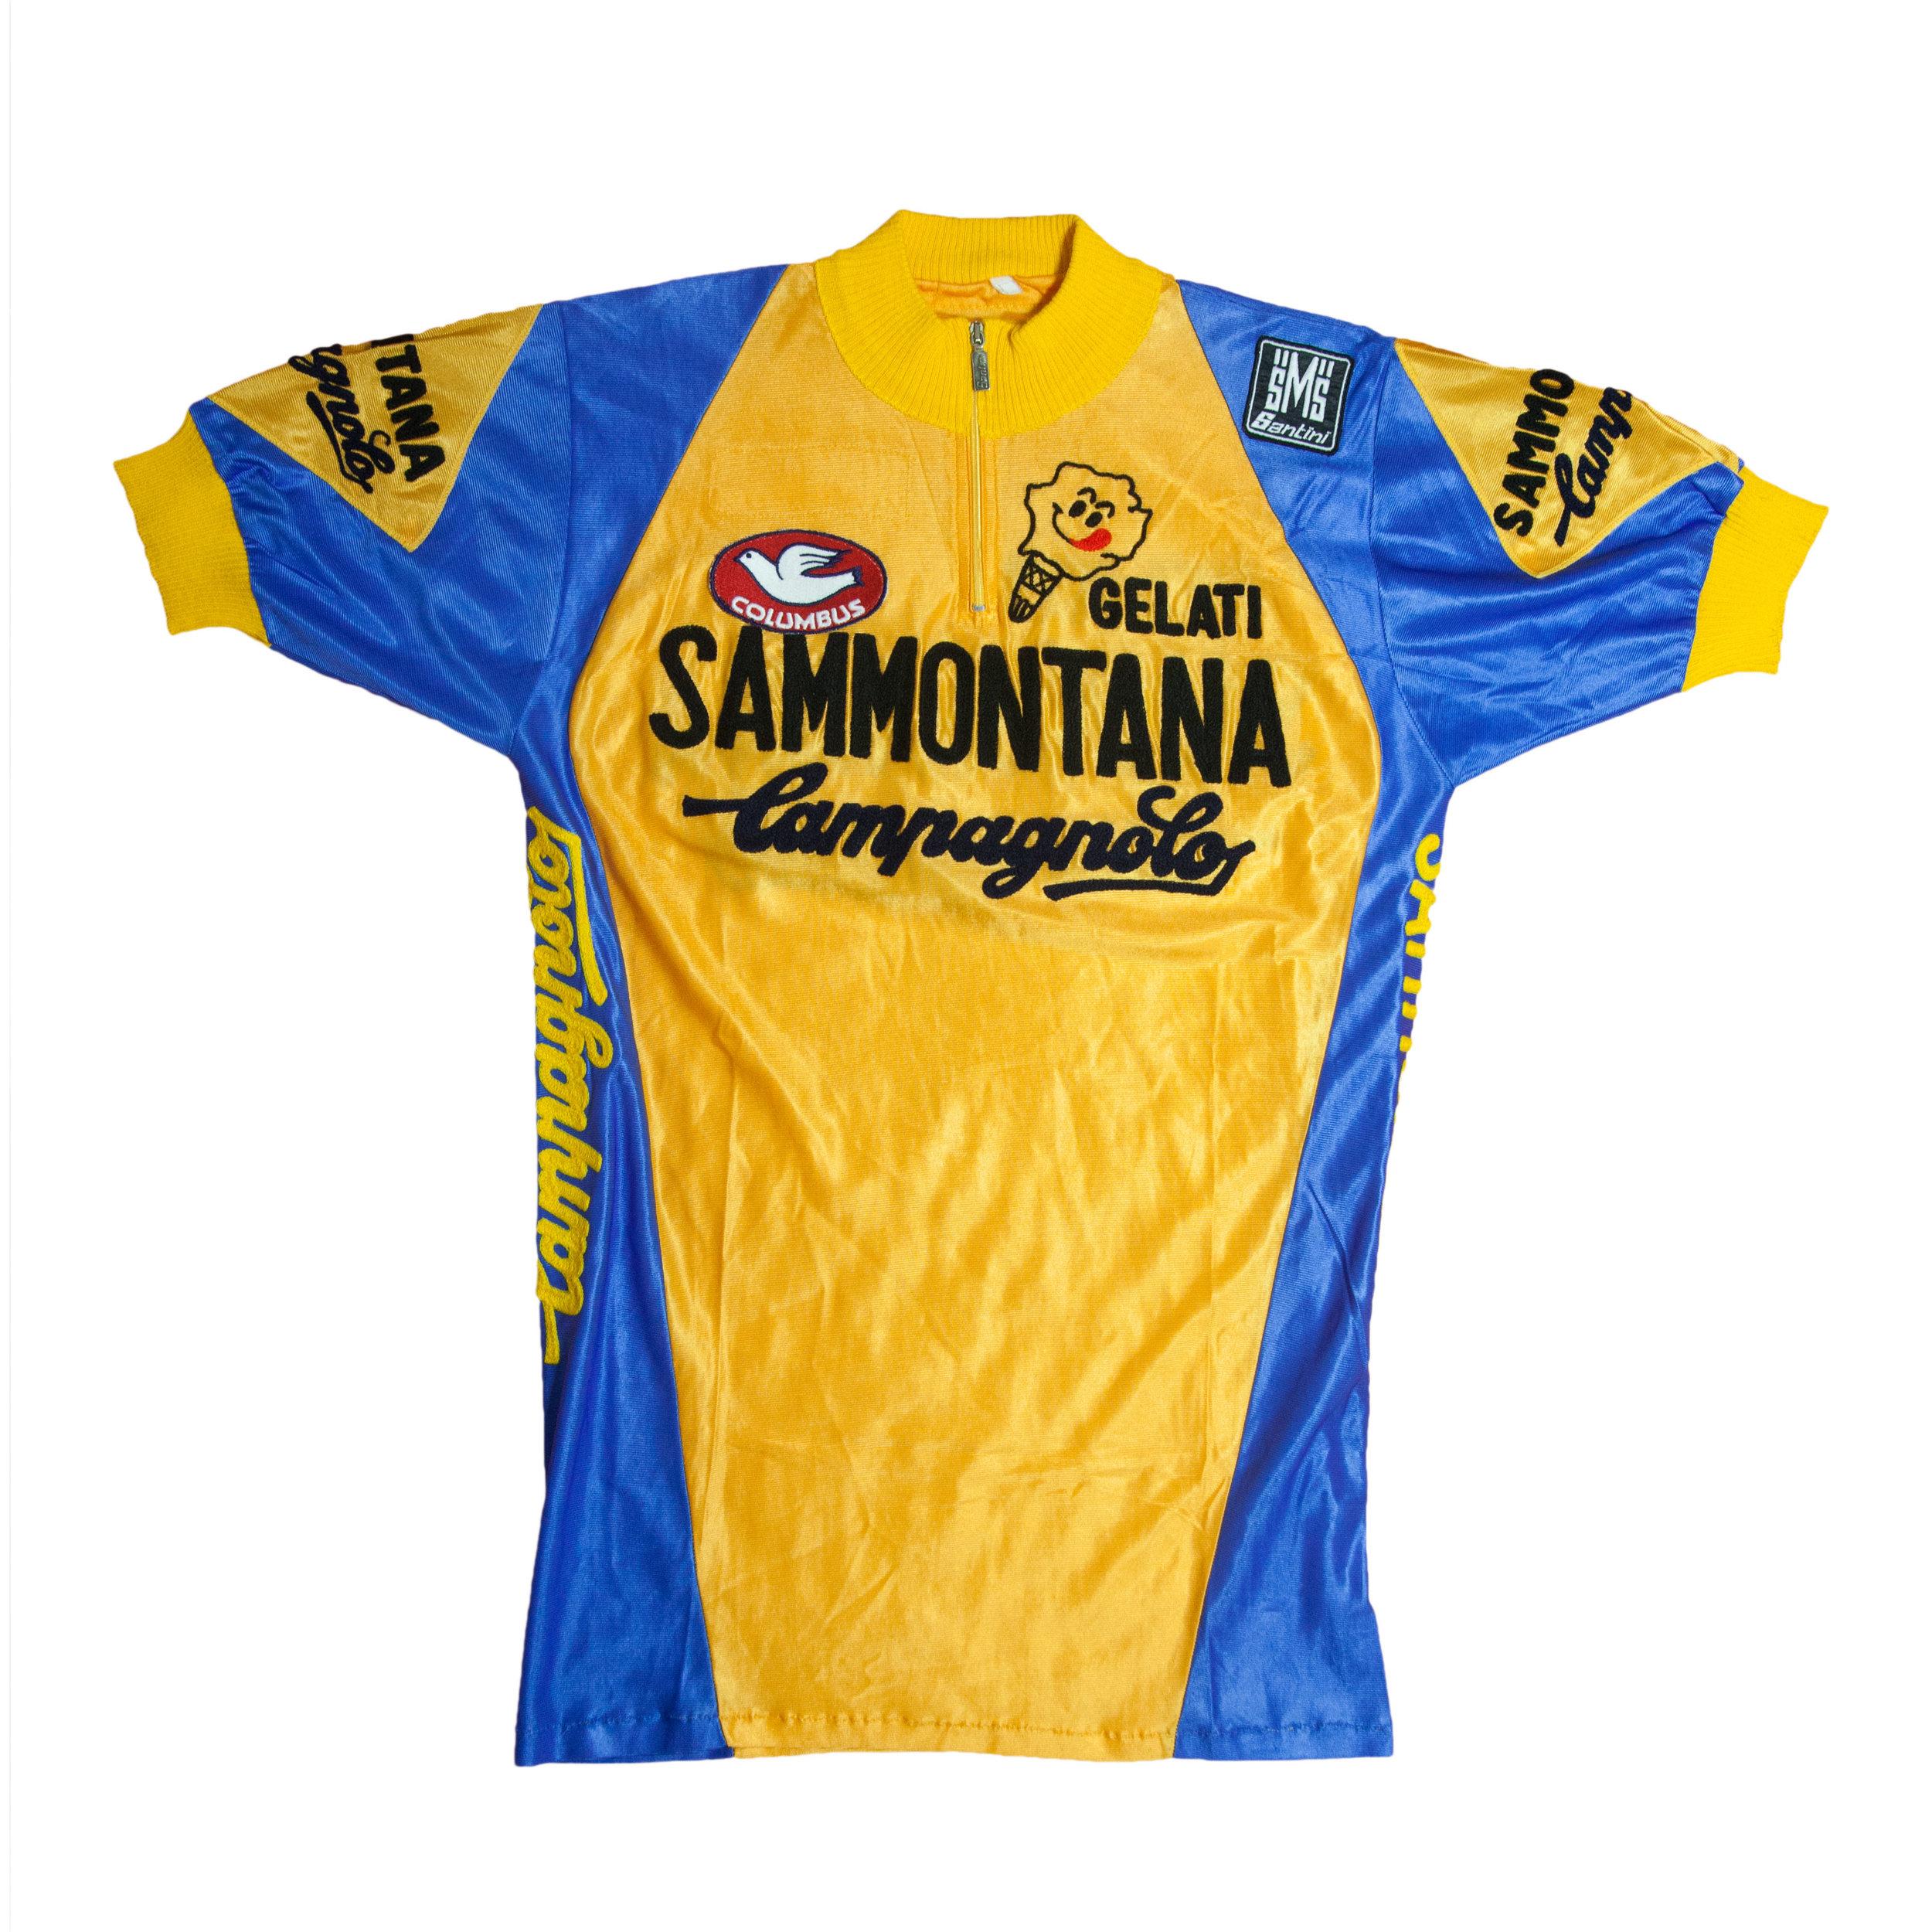 Sammontana_Front.jpg